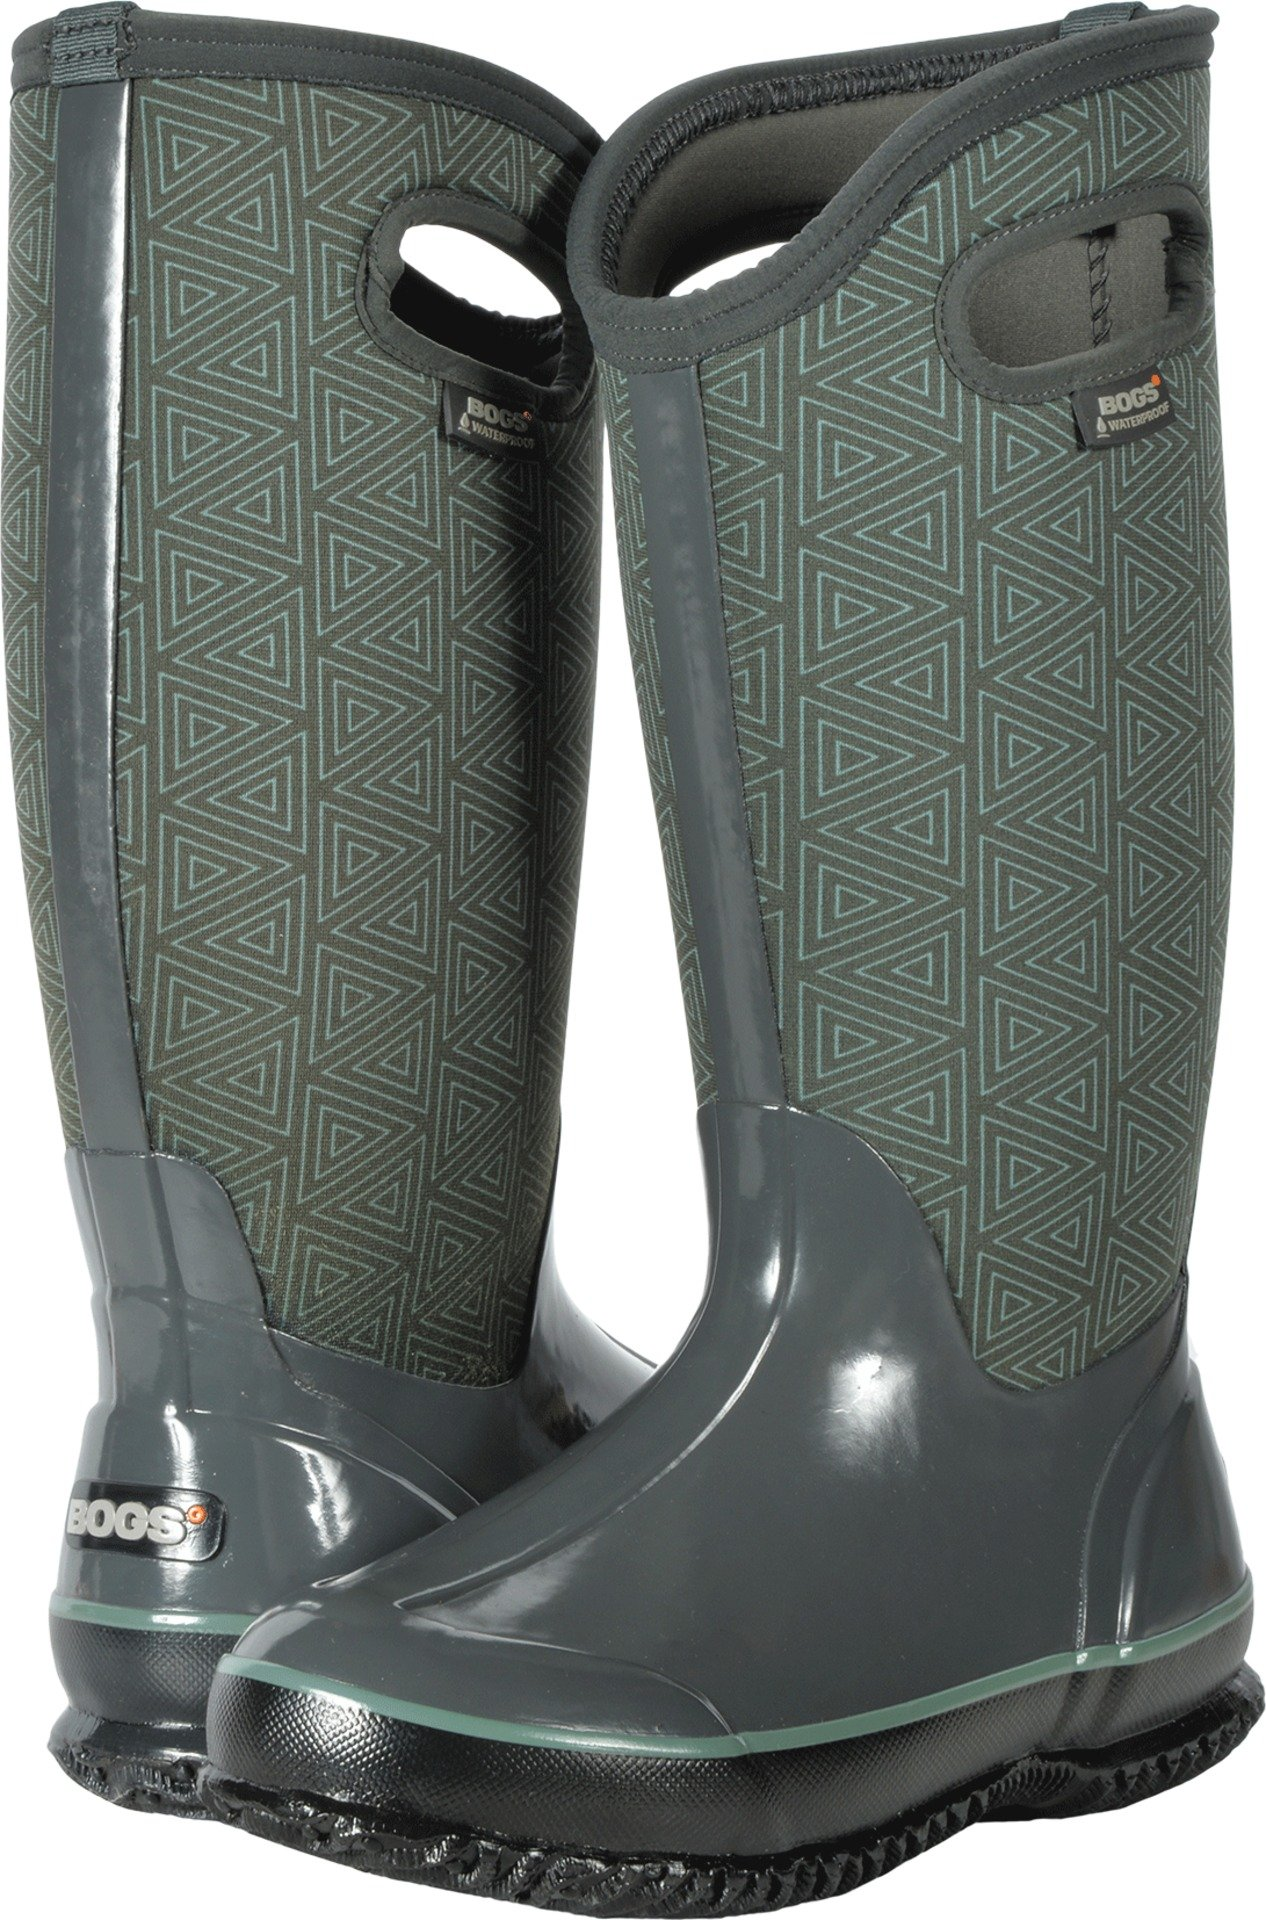 Bogs Women's Classic Triangles Snow Boot, Dark Gray Multi, 7 M US